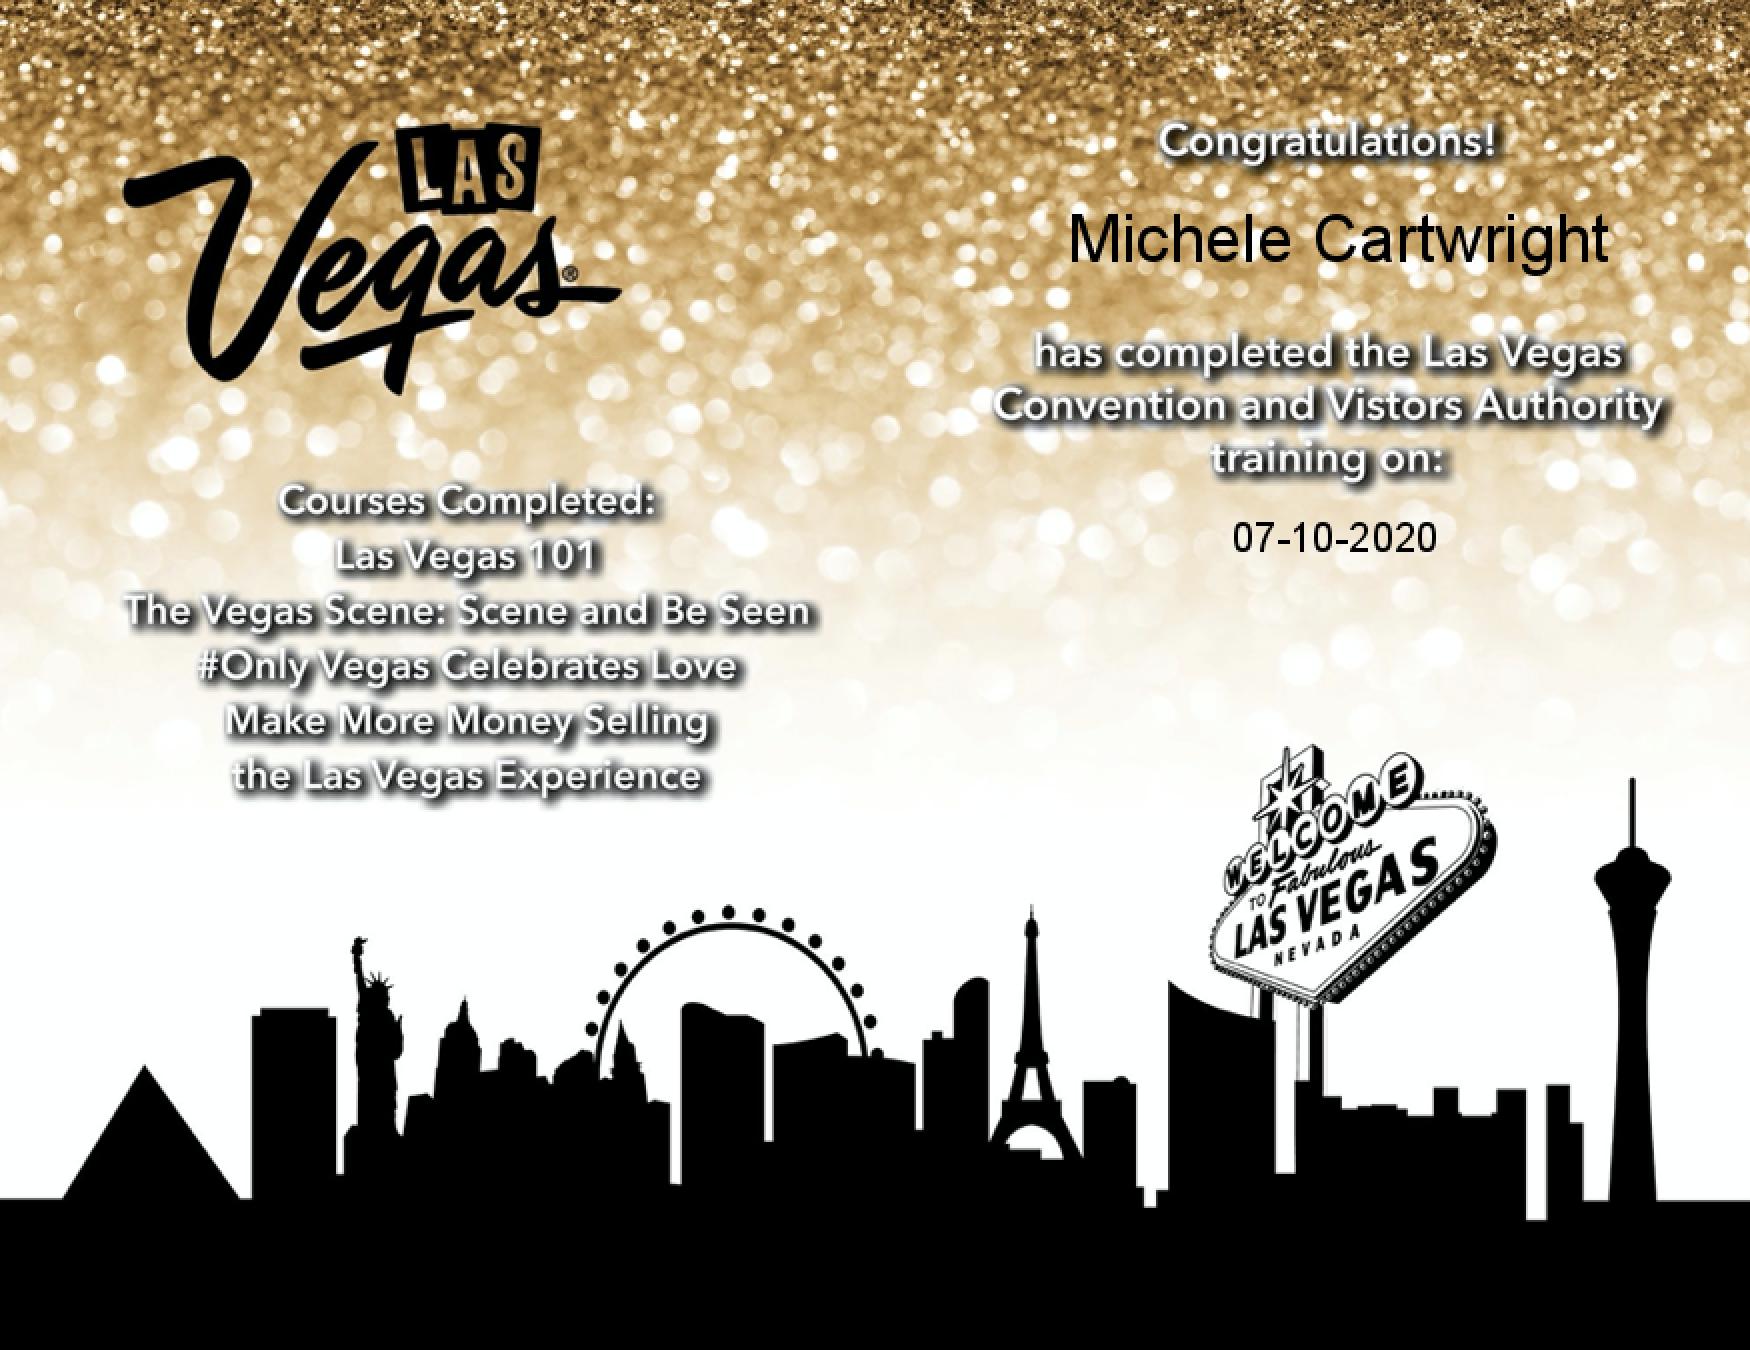 Michele Las Vegas 2020.07.png